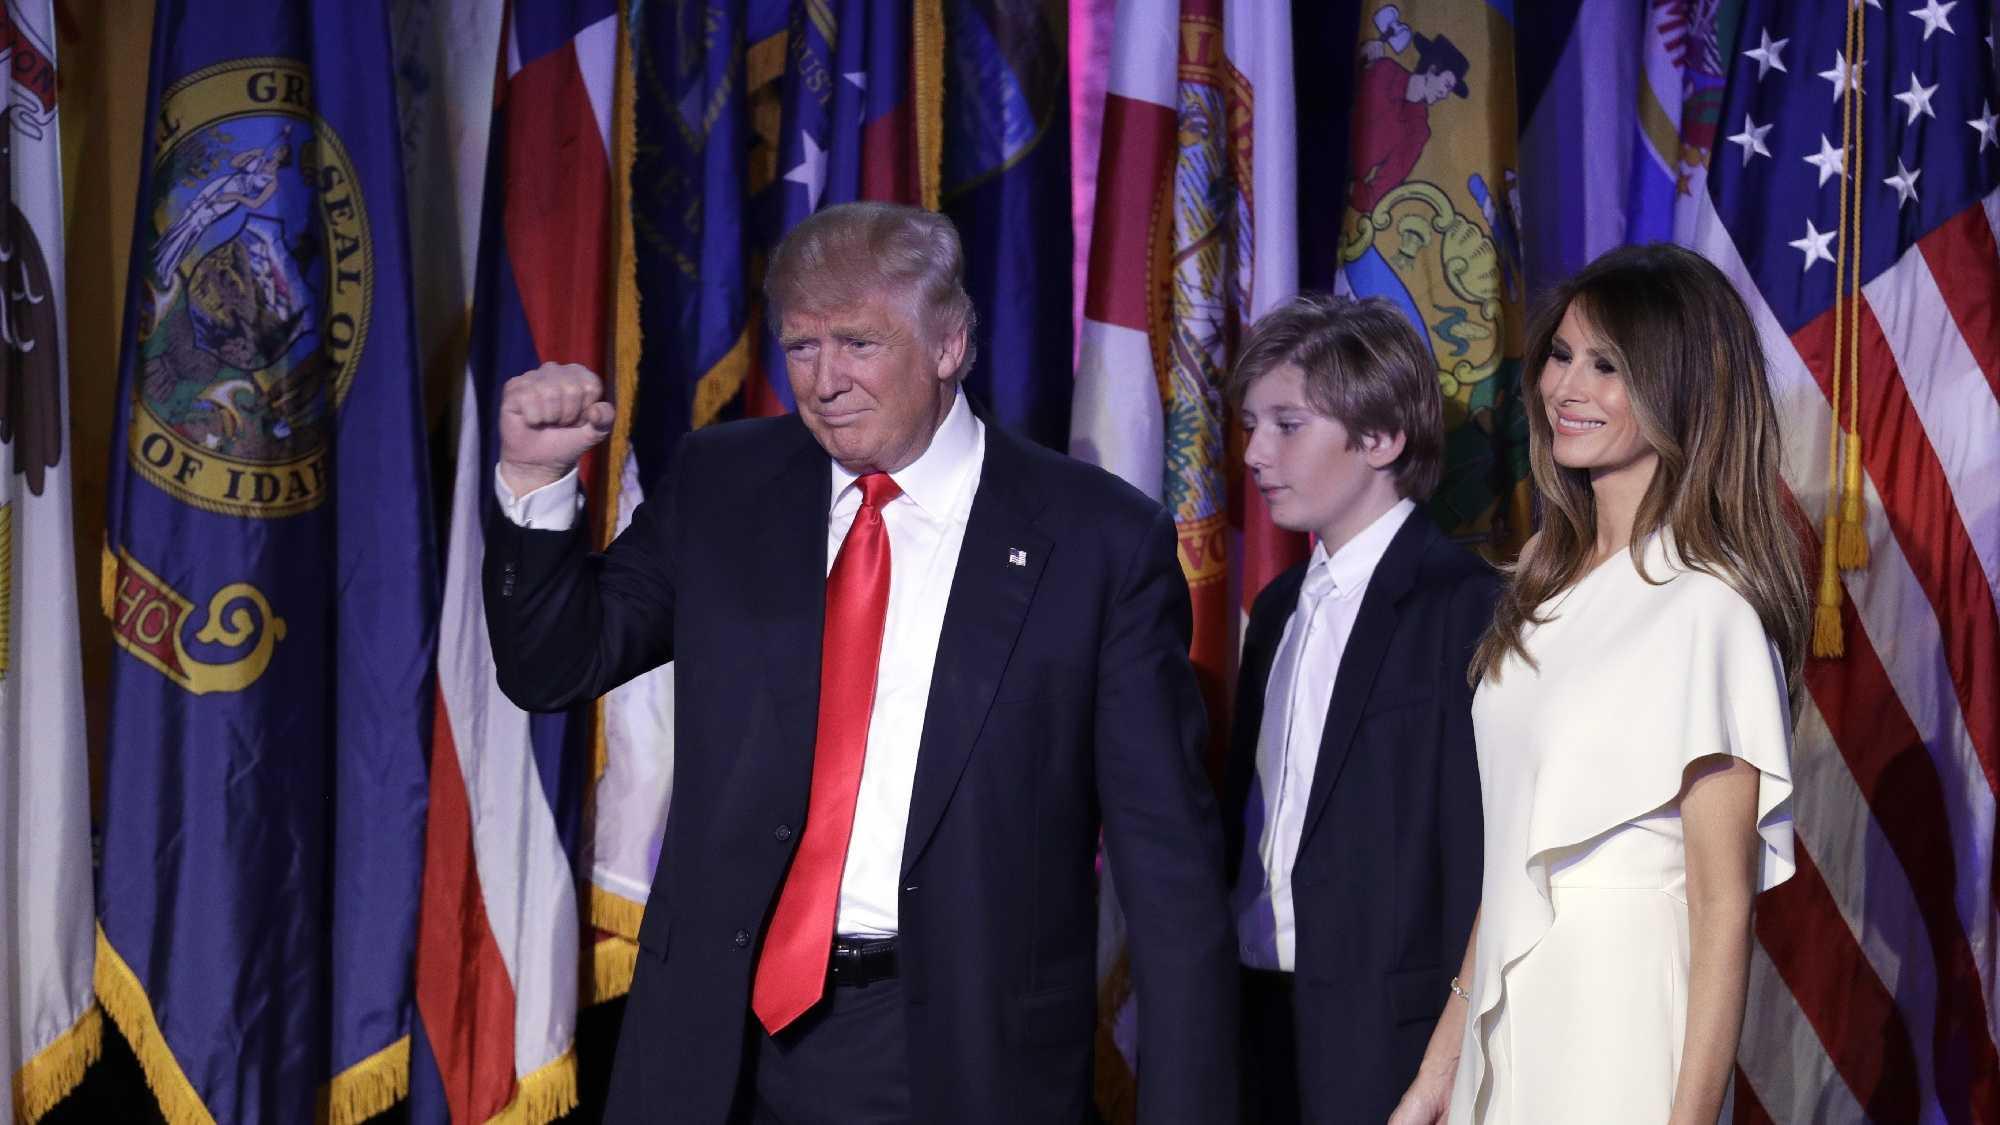 trump election night win.jpg